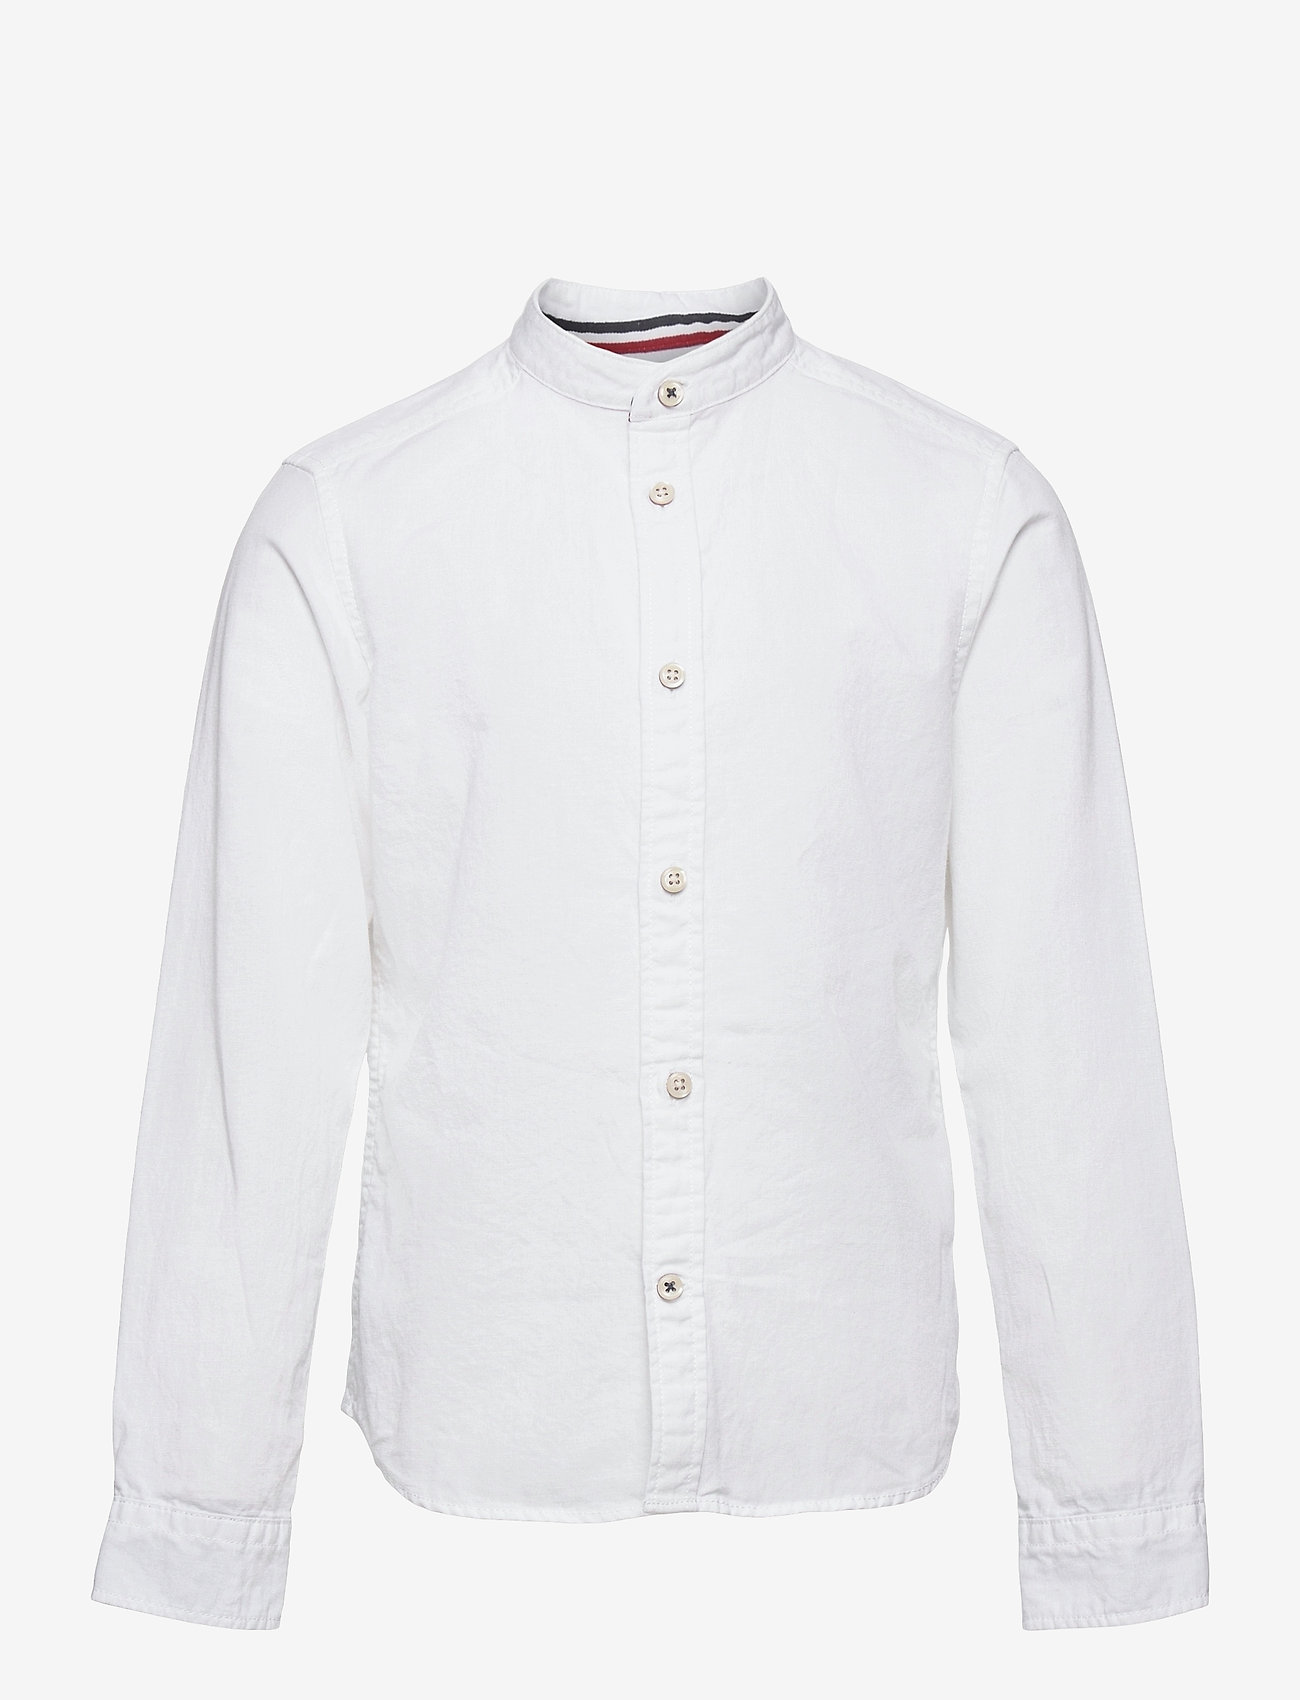 Jack & Jones - JJEBAND SUMMER SHIRT L/S JR - shirts - white - 0